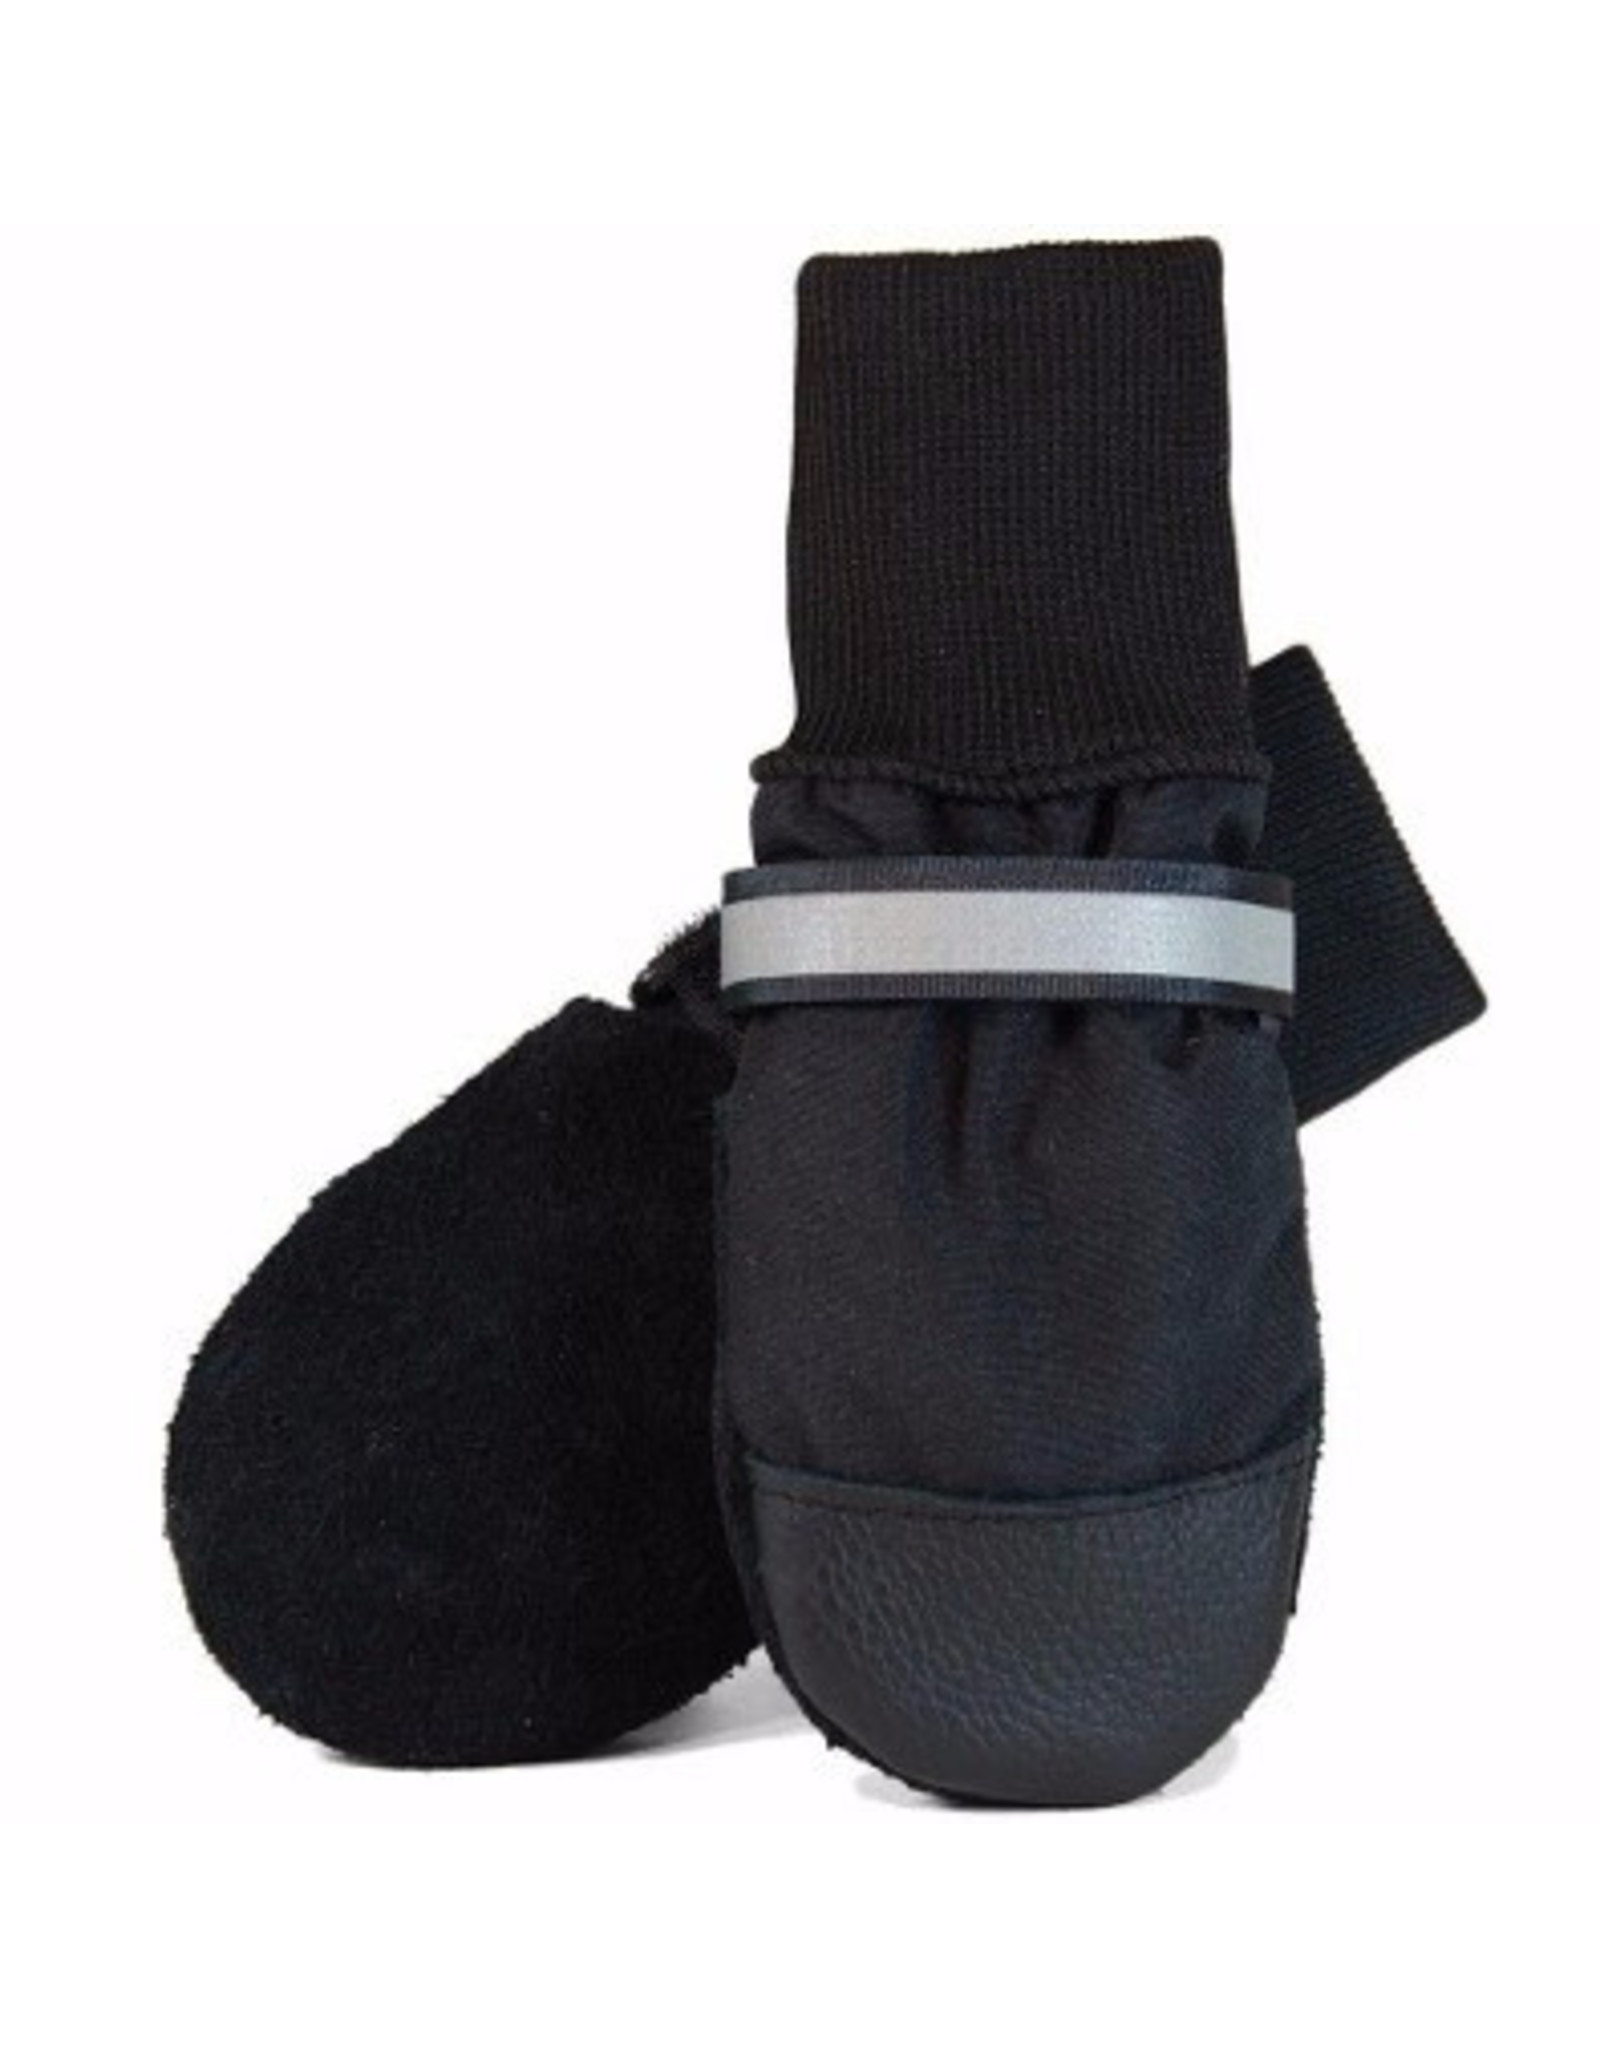 Muttluks Muttluks All-Weather Boots - Black XXS